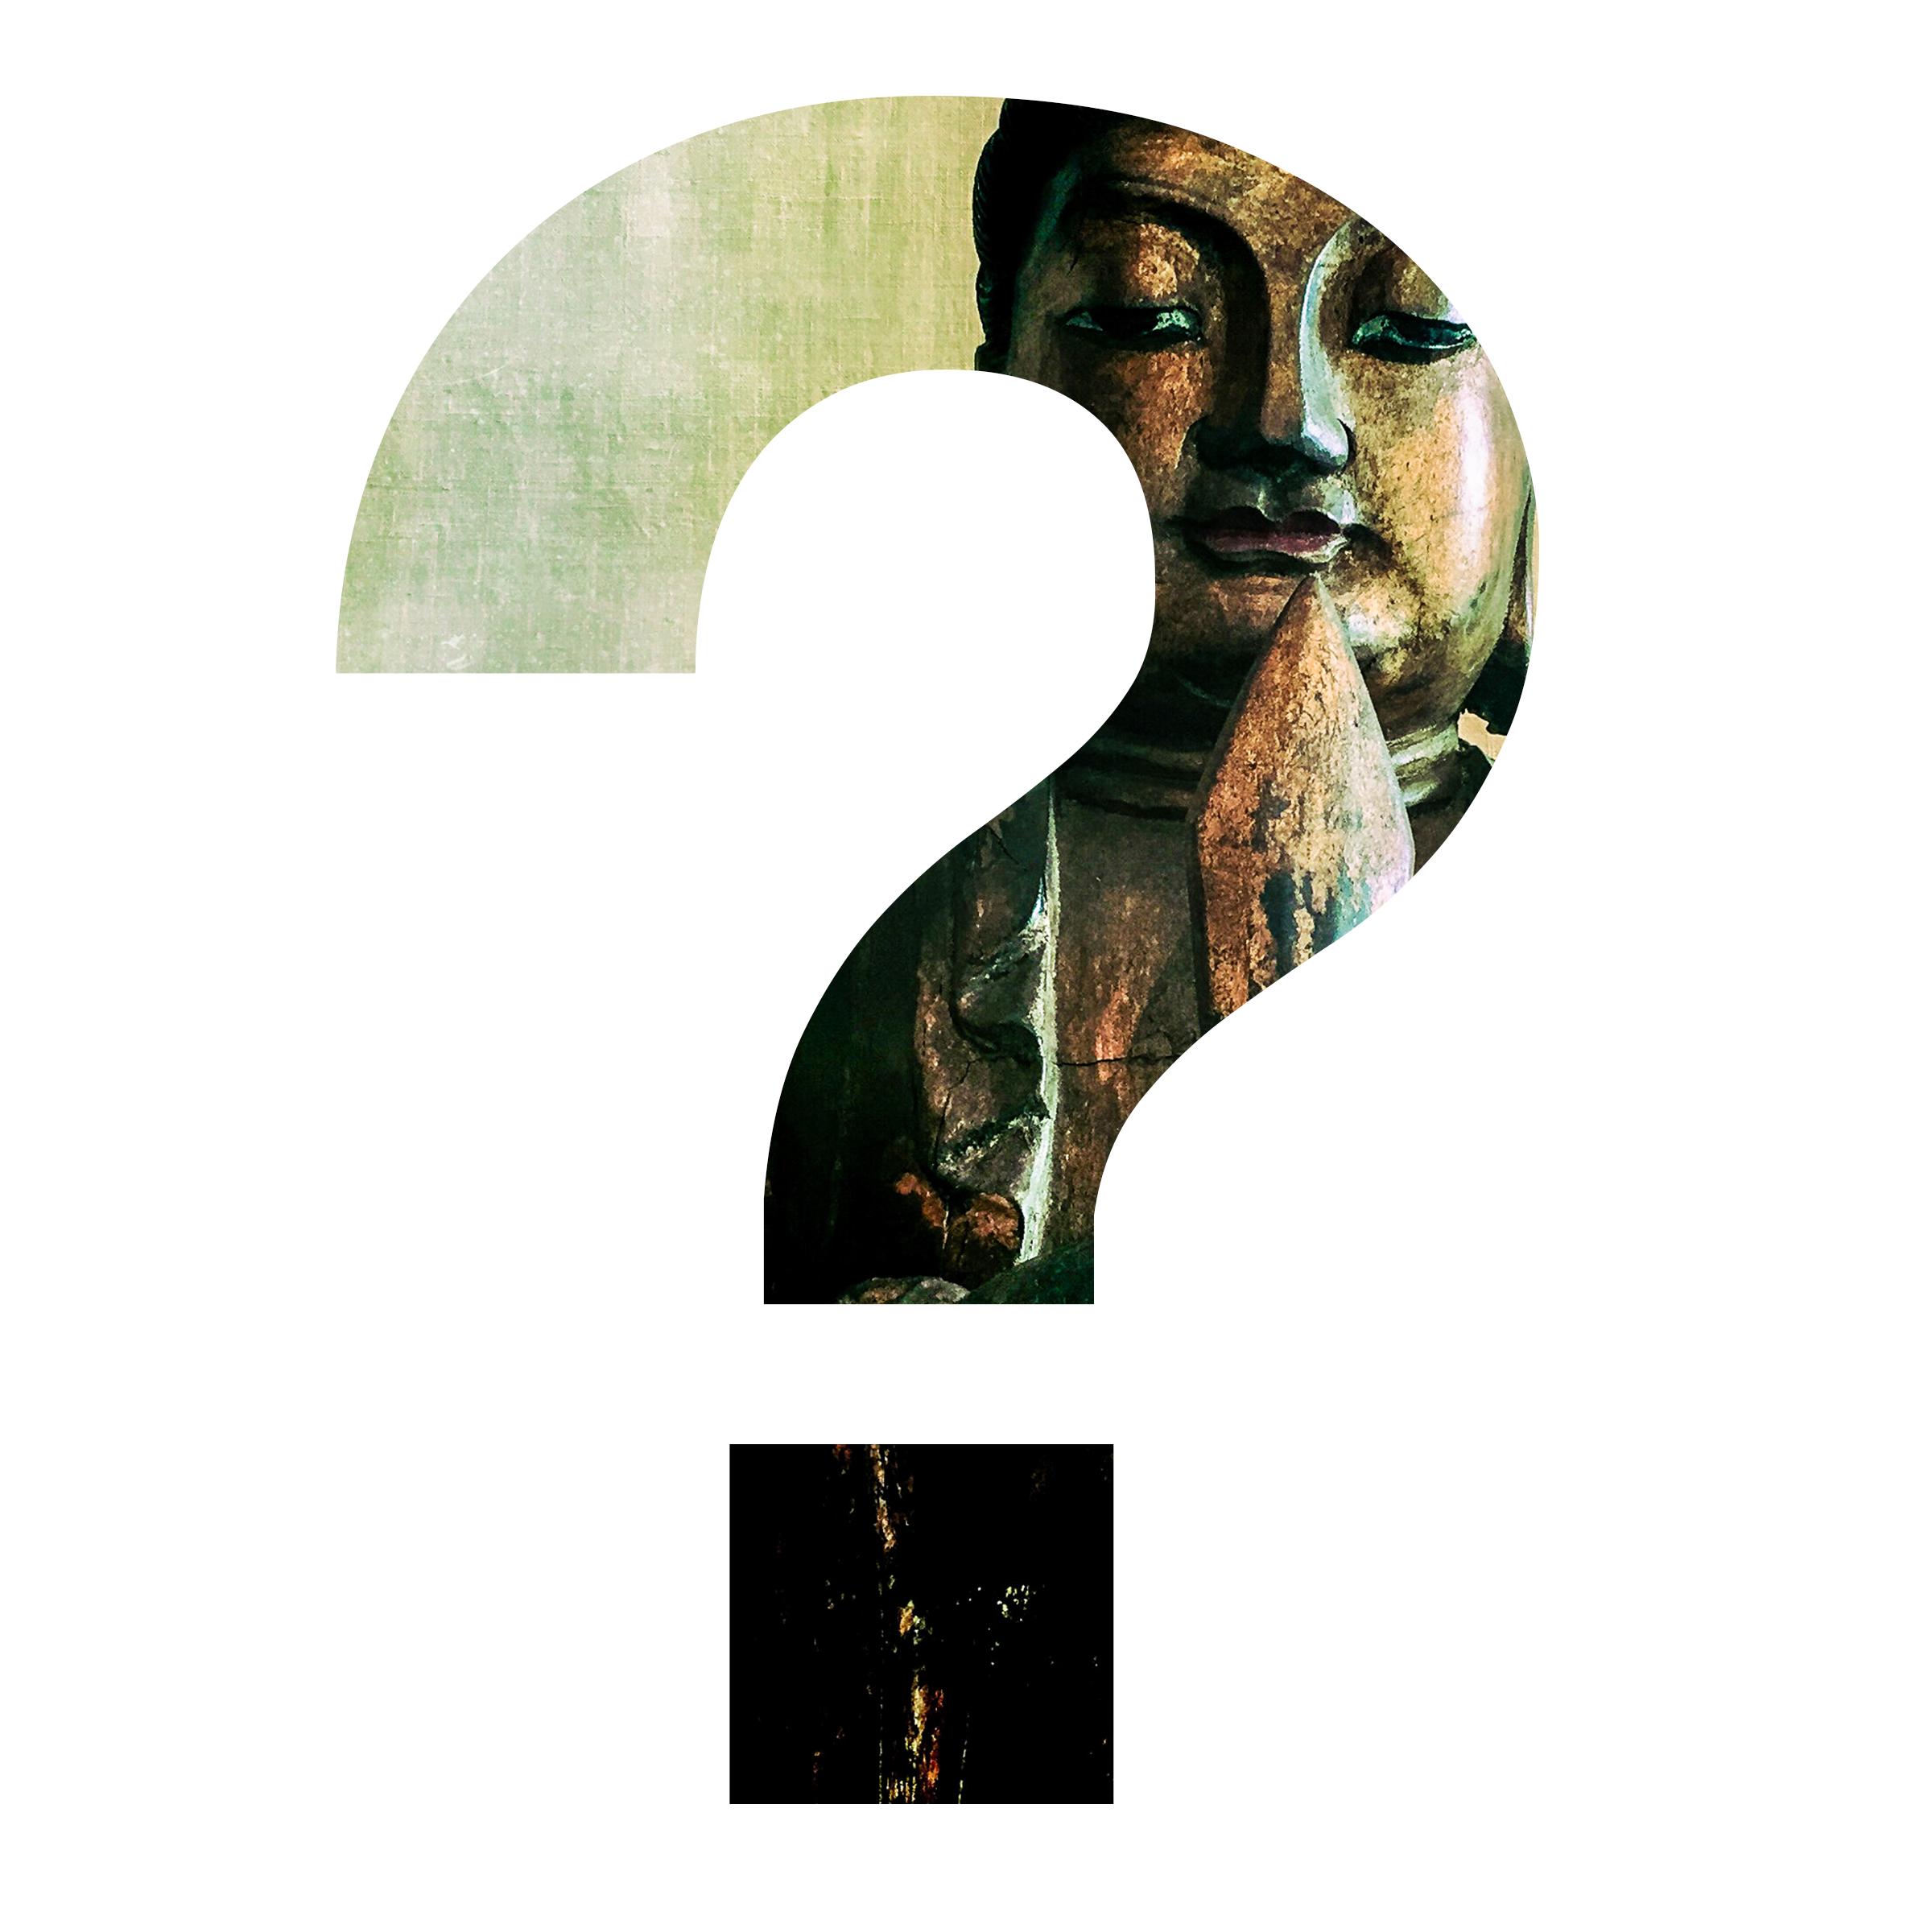 manjushri within a question mark